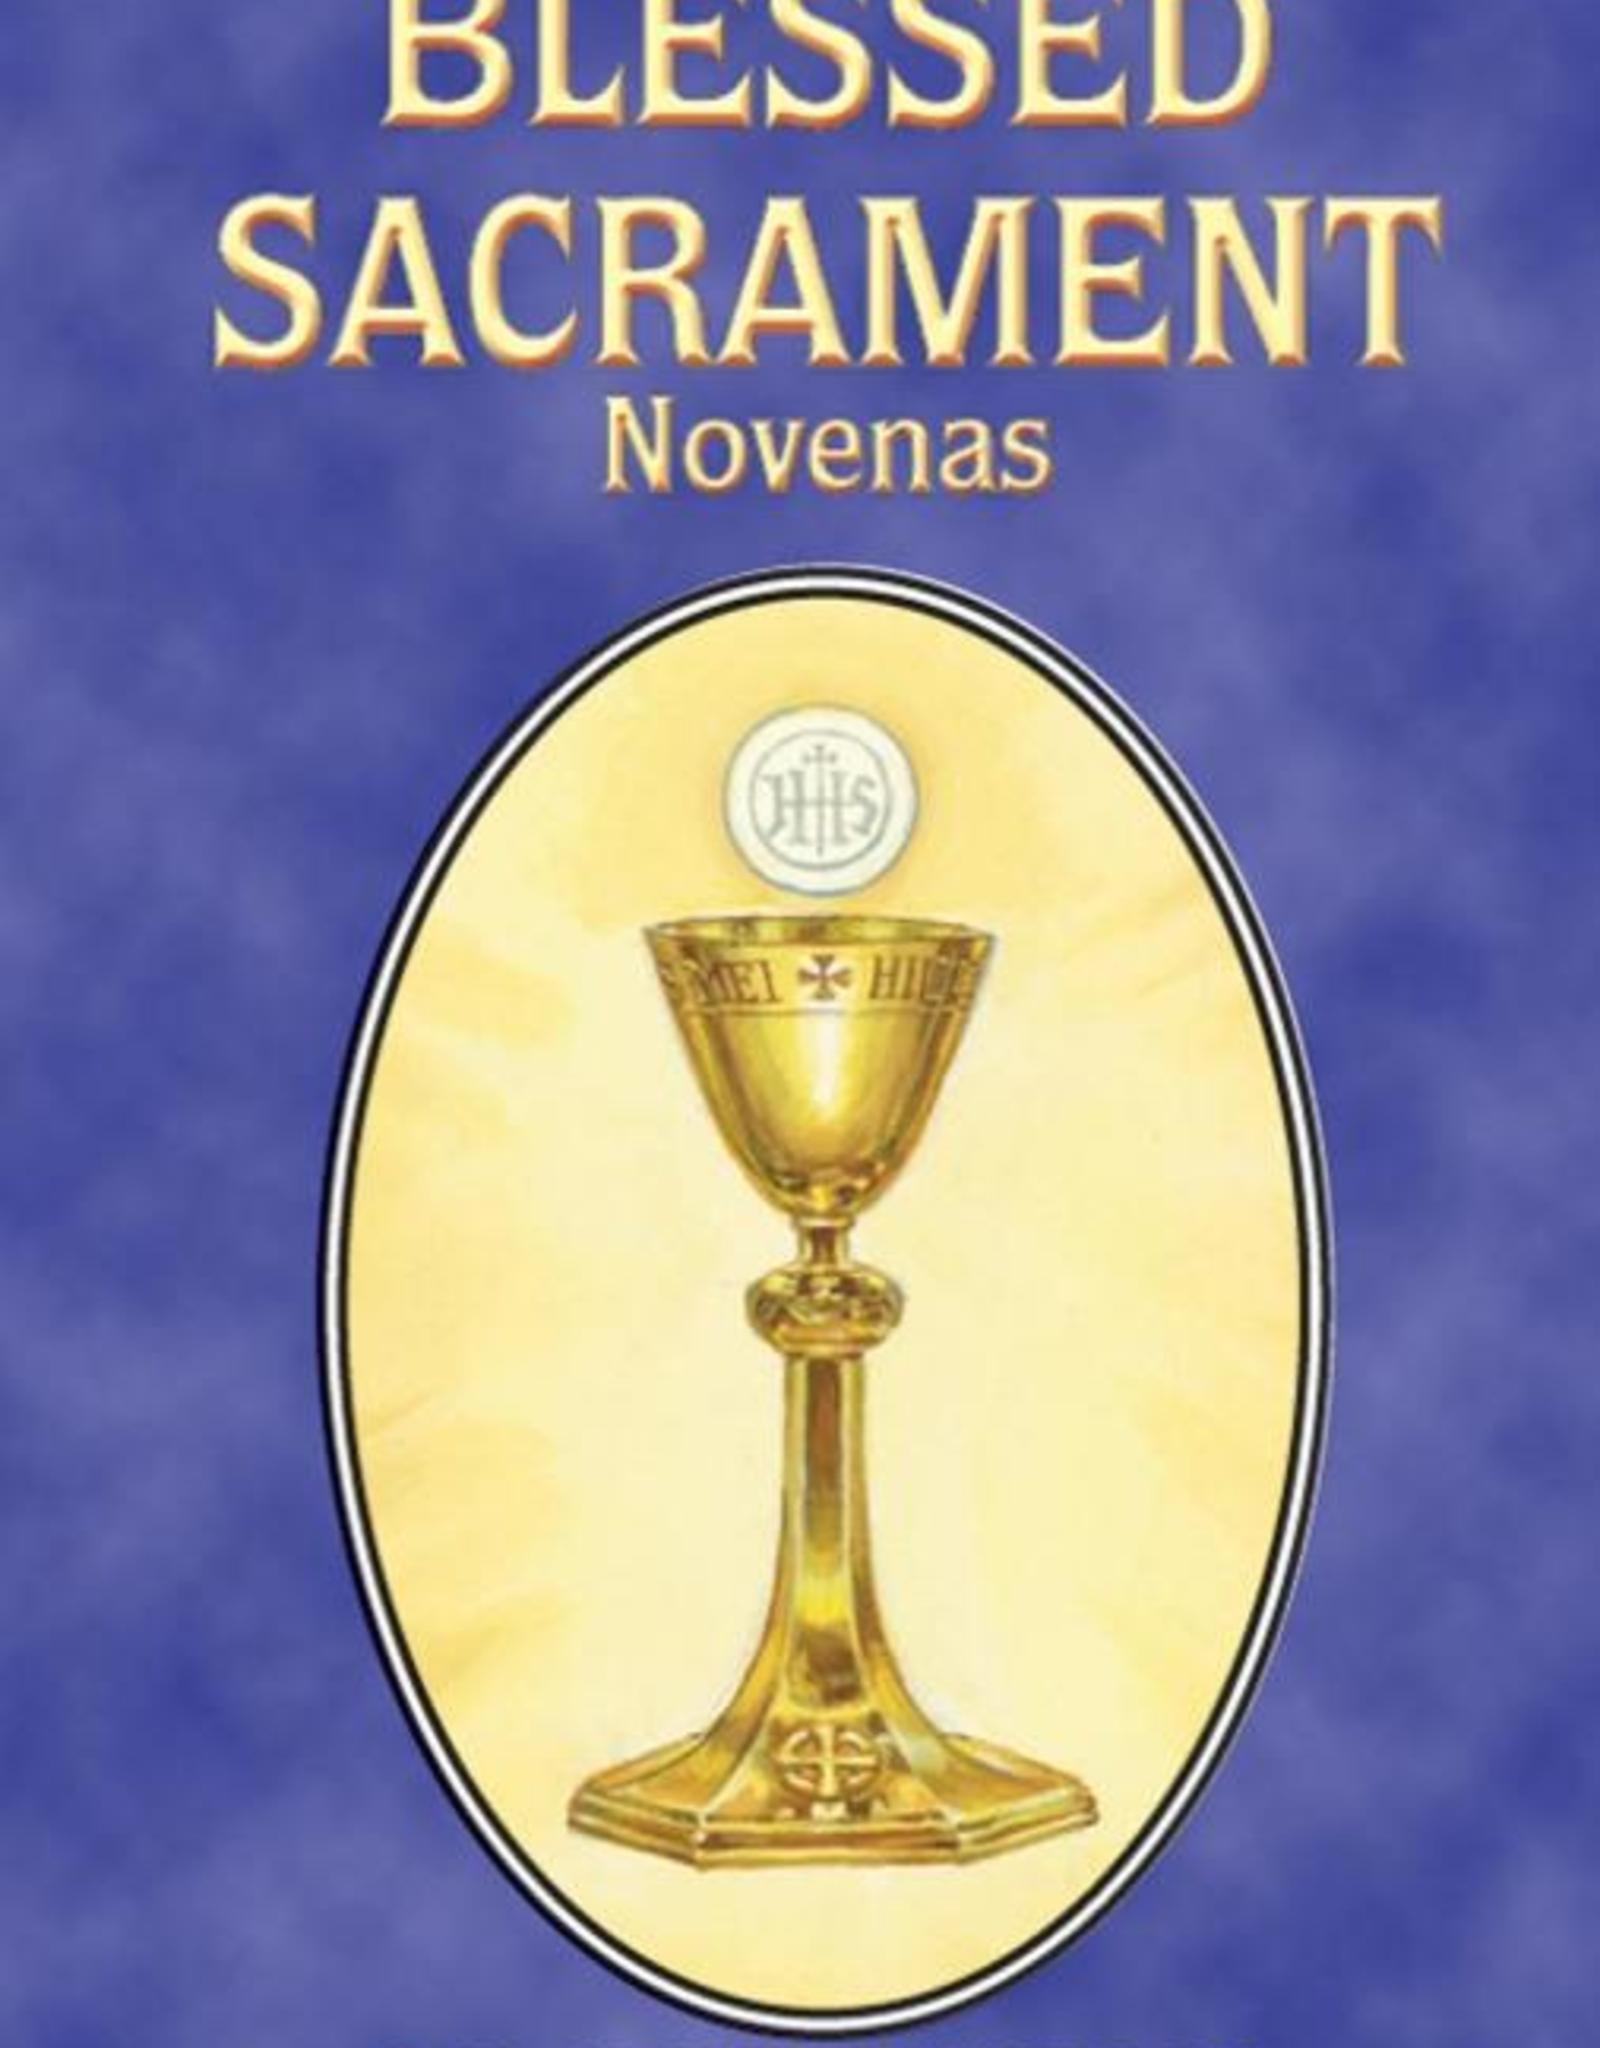 Catholic Book Publishing Blessed Sacrament Novenas, by Rev. Lawrence Lovasik